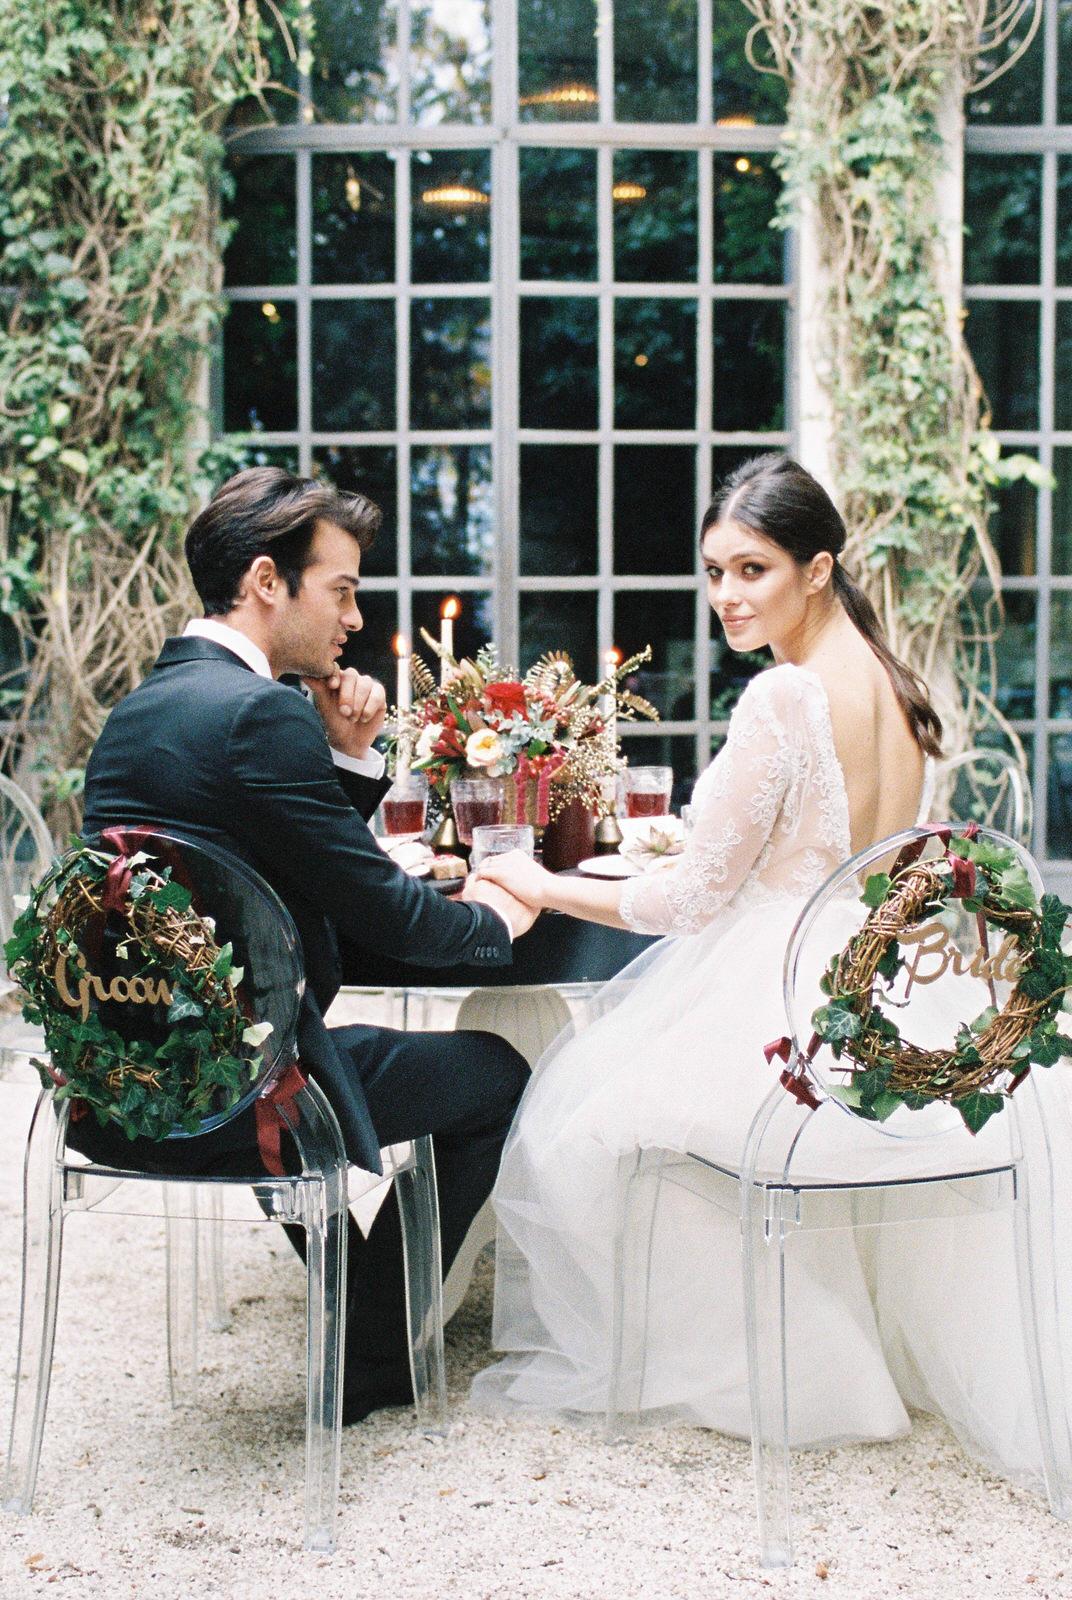 Celebration in Garden, Whimsical Wedding in Istanbul  - Fidan Kandemir Photography